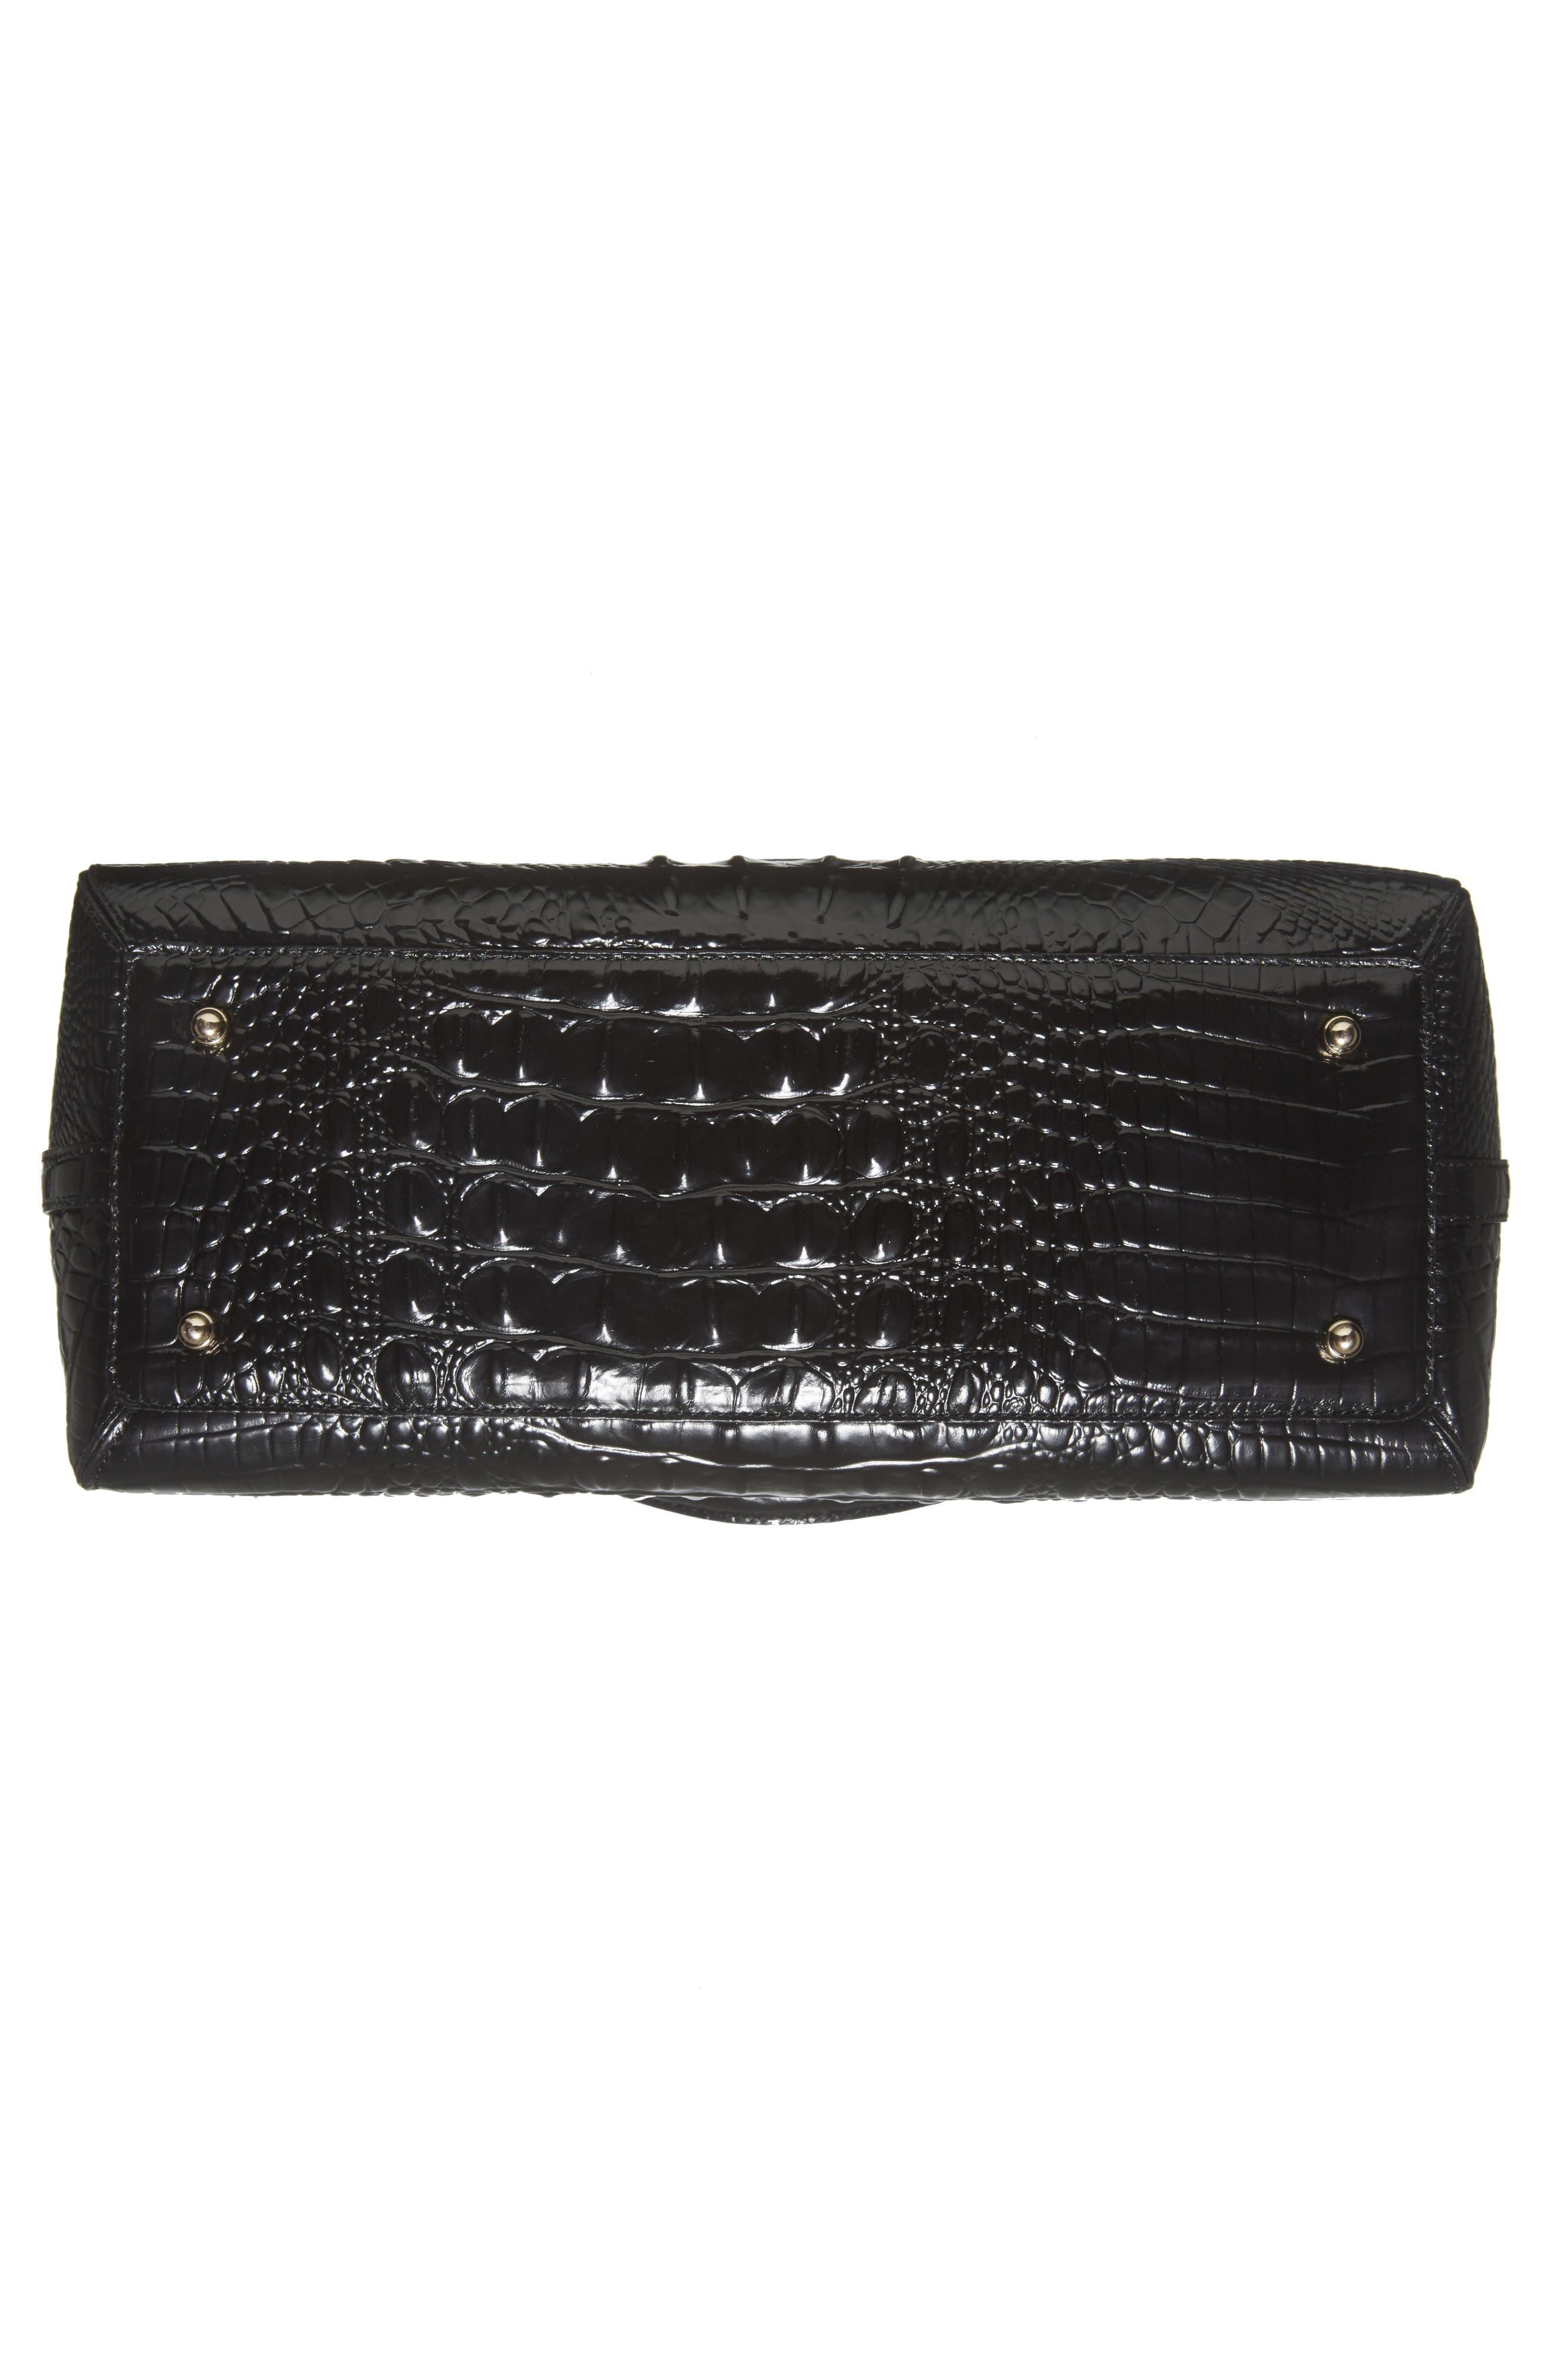 Melbourne – Sydney Croc Embossed Leather Satchel,                             Alternate thumbnail 6, color,                             Black